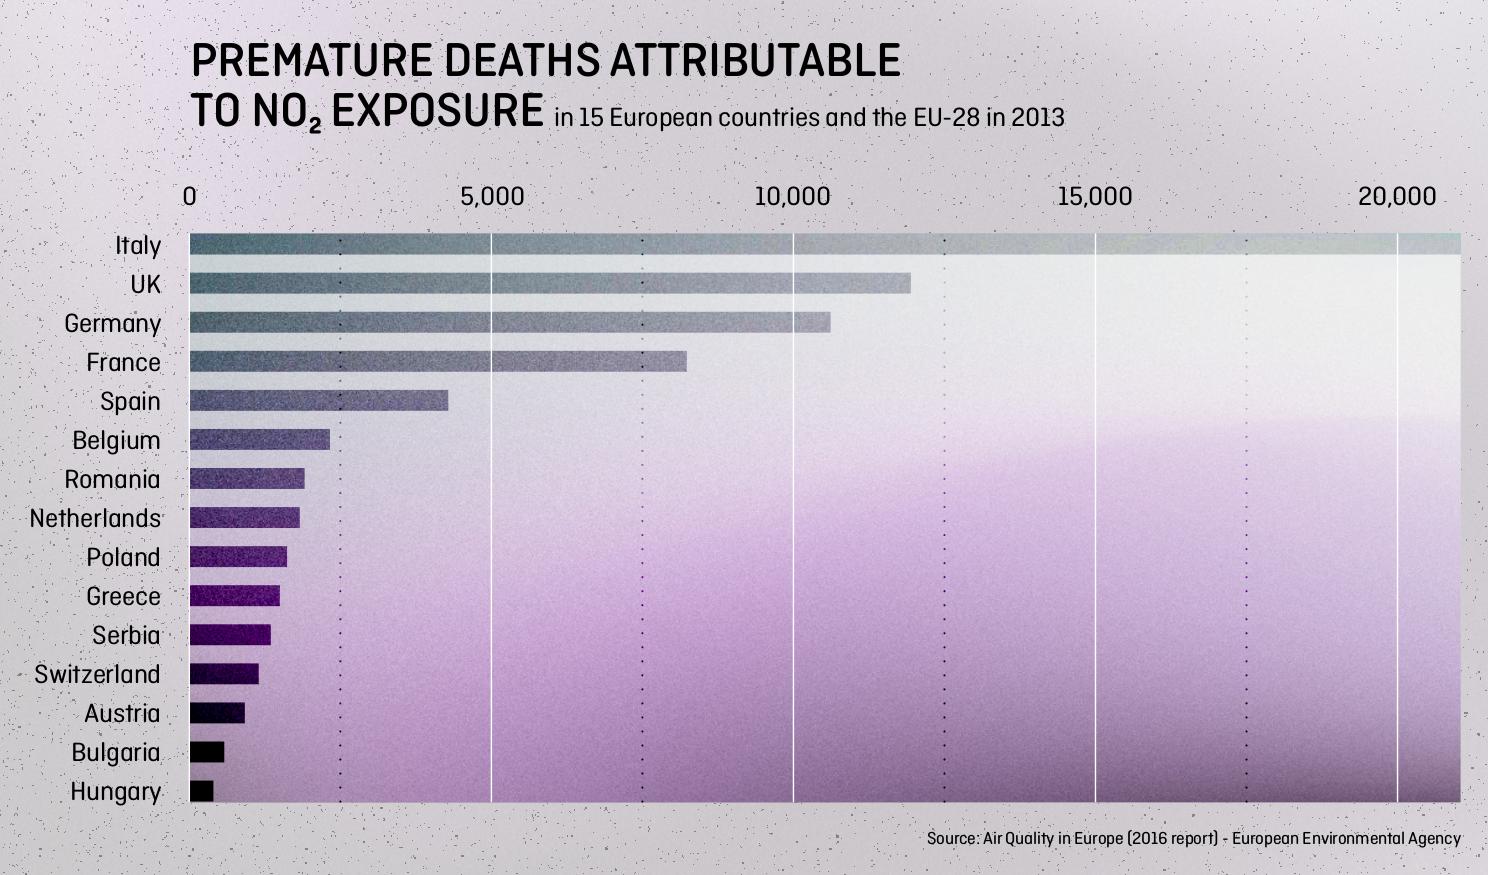 muerte prematuras por NO2.png